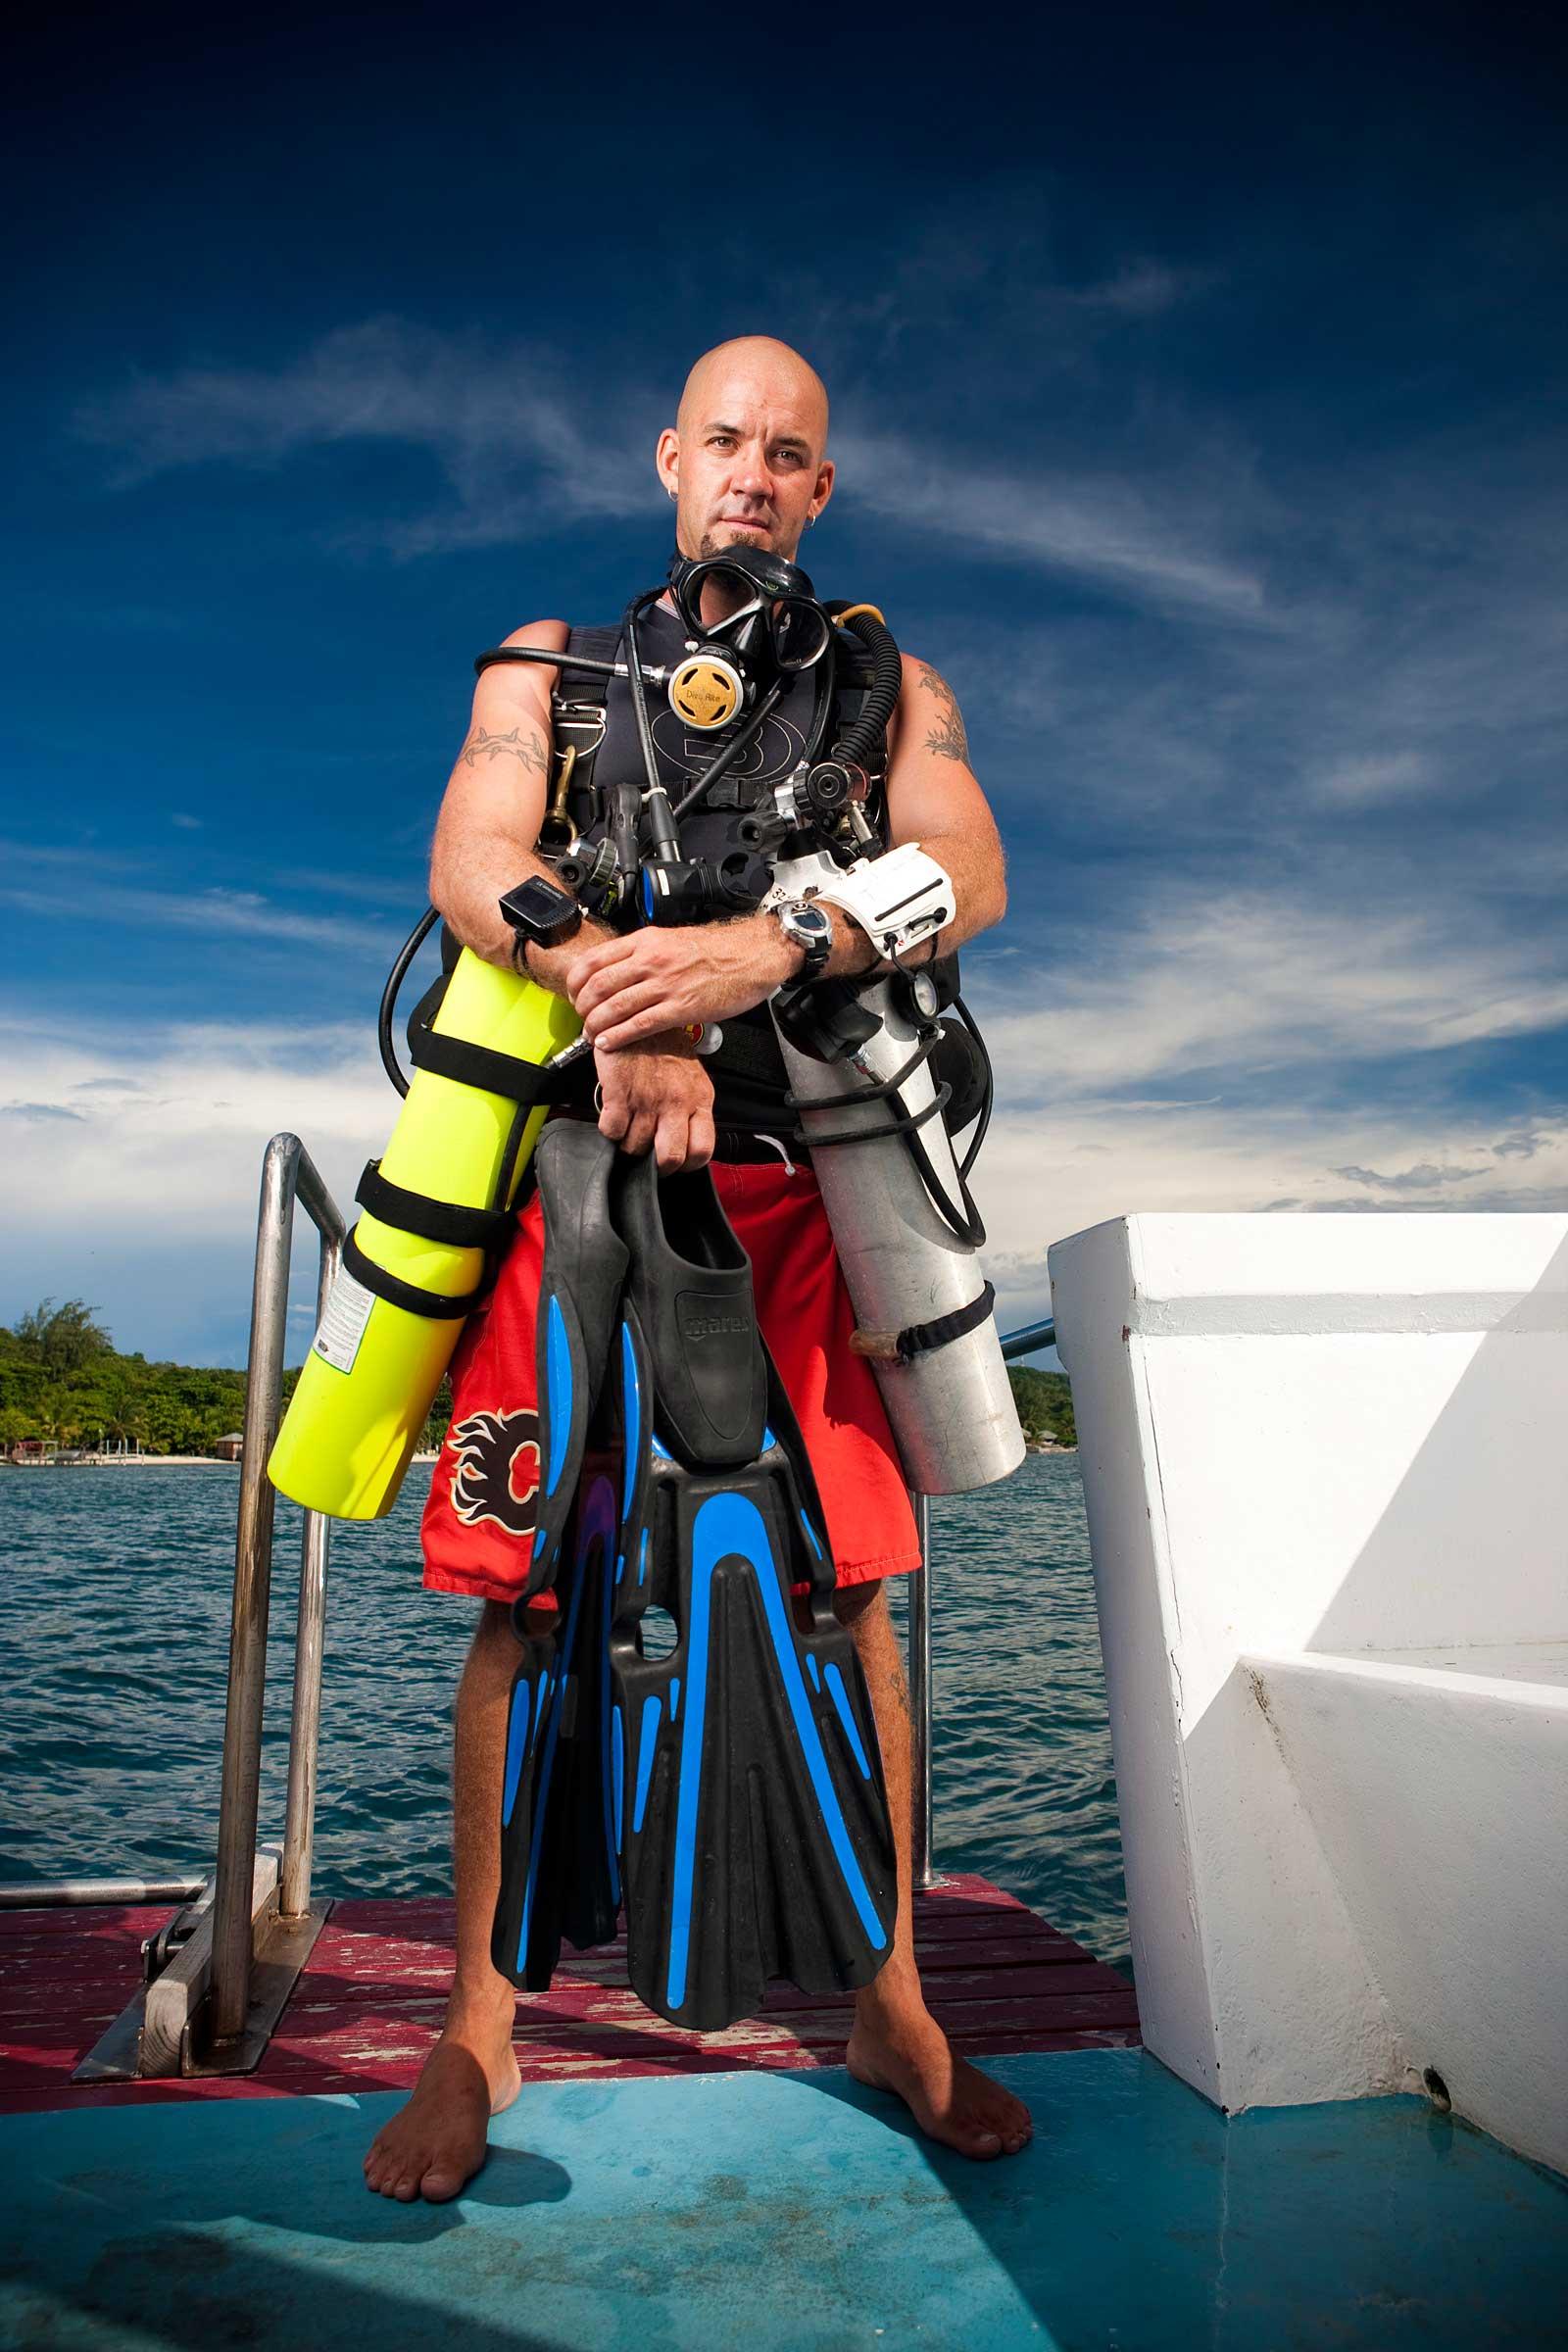 sidemount instructor monty graham